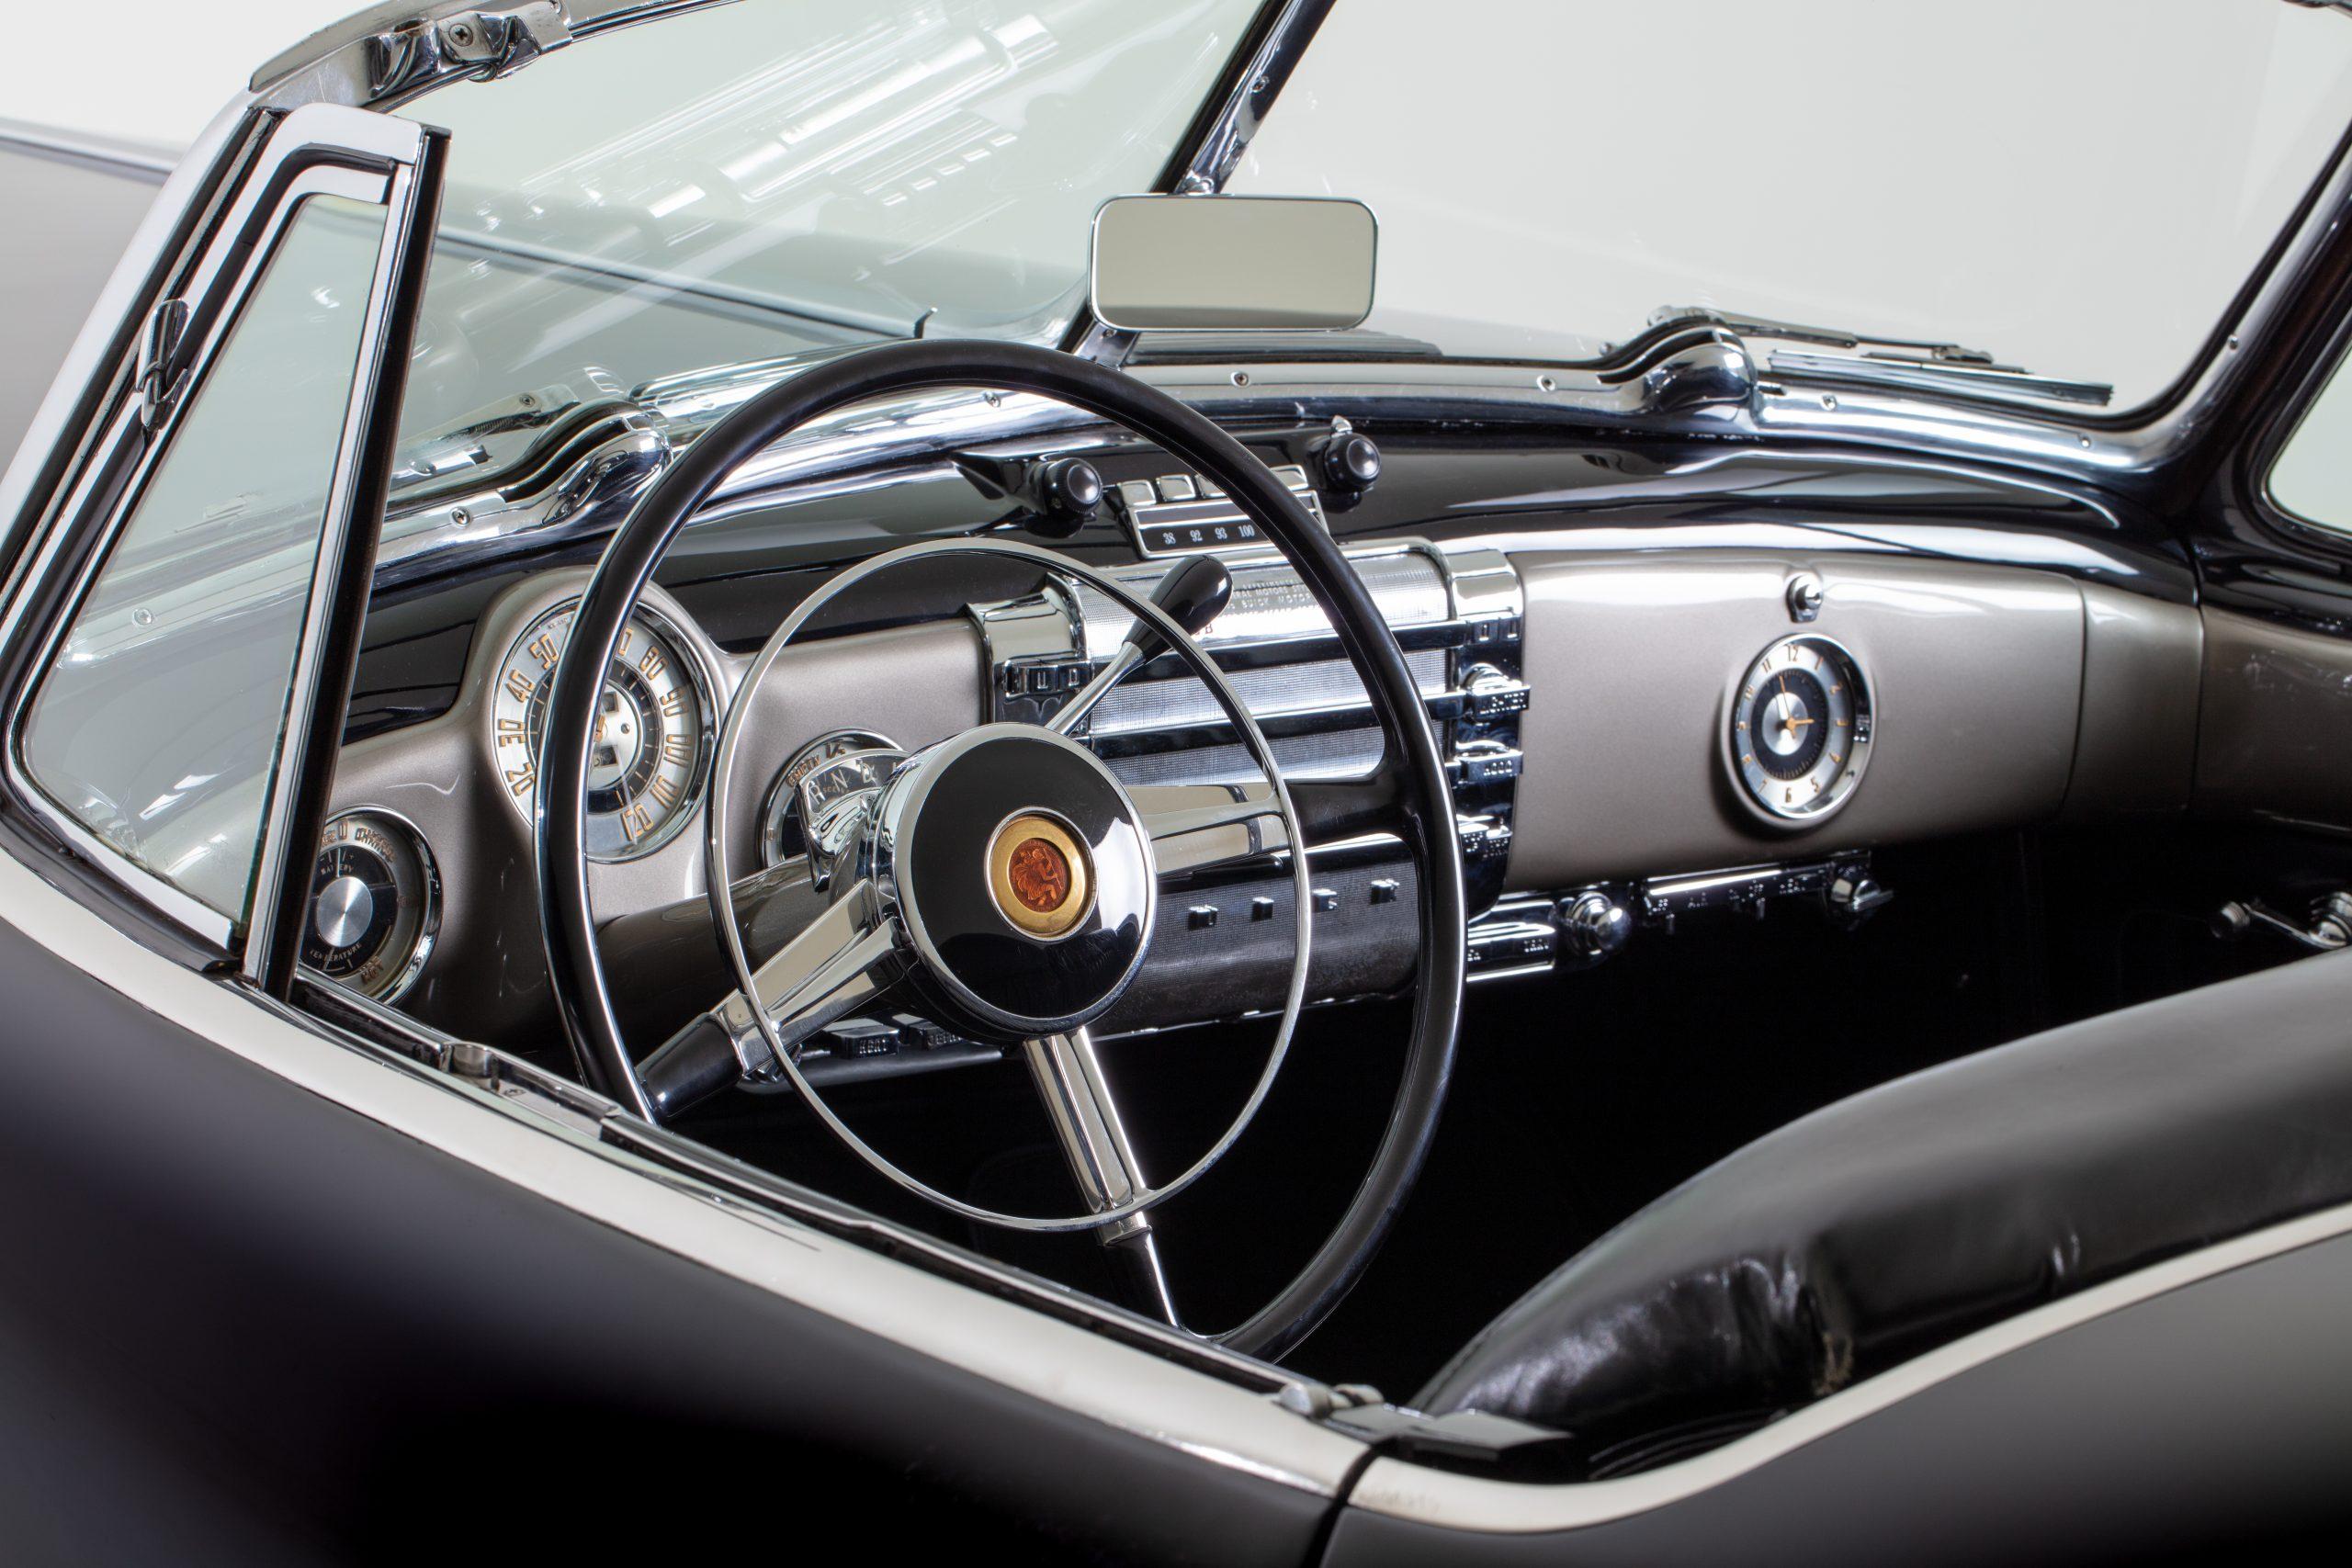 Buick Y-Job Interior Front Dash And Steering Wheel